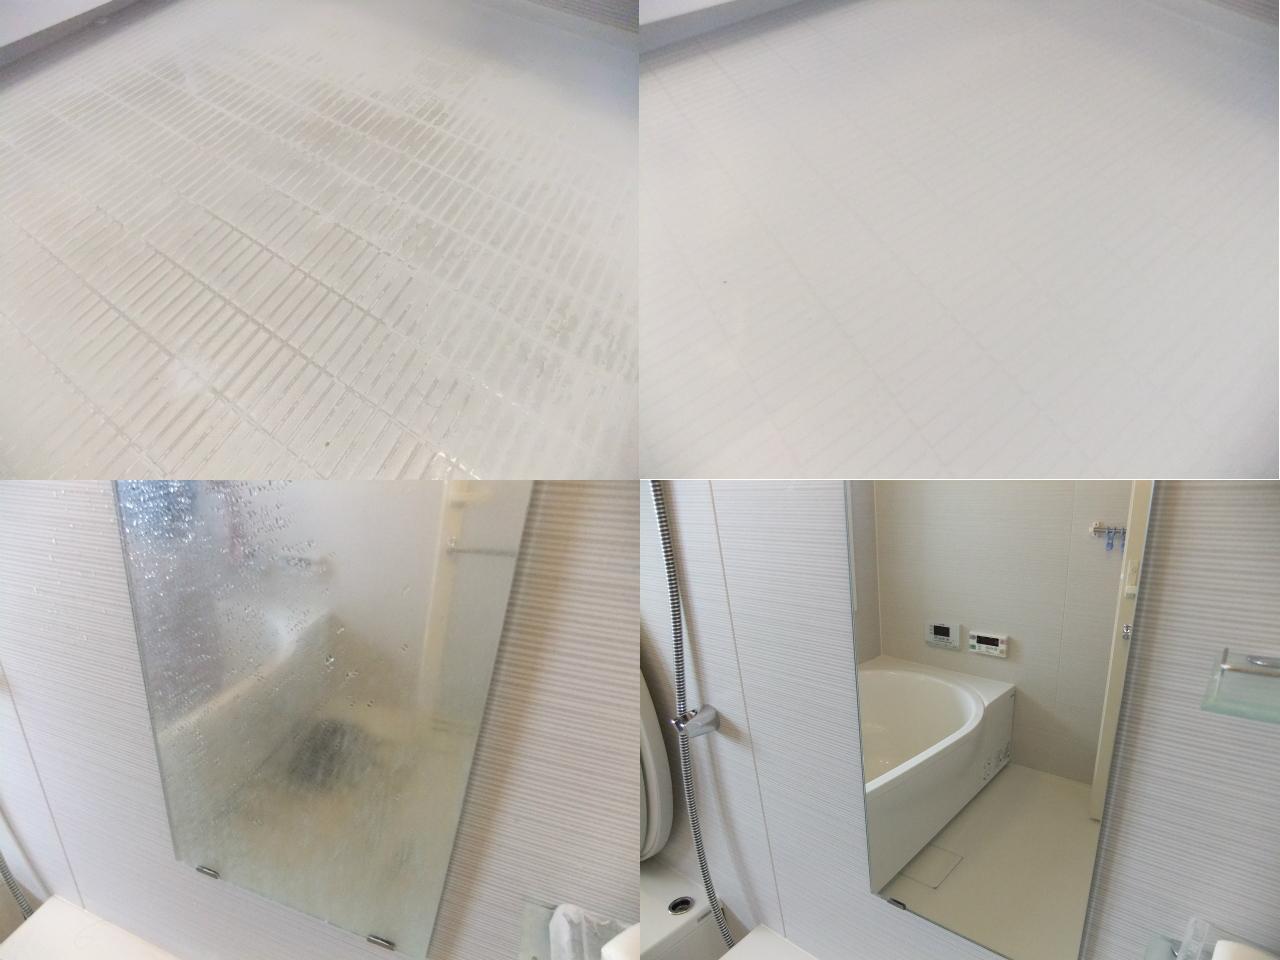 http://ajras.net/images/120625-bathroom1.jpg